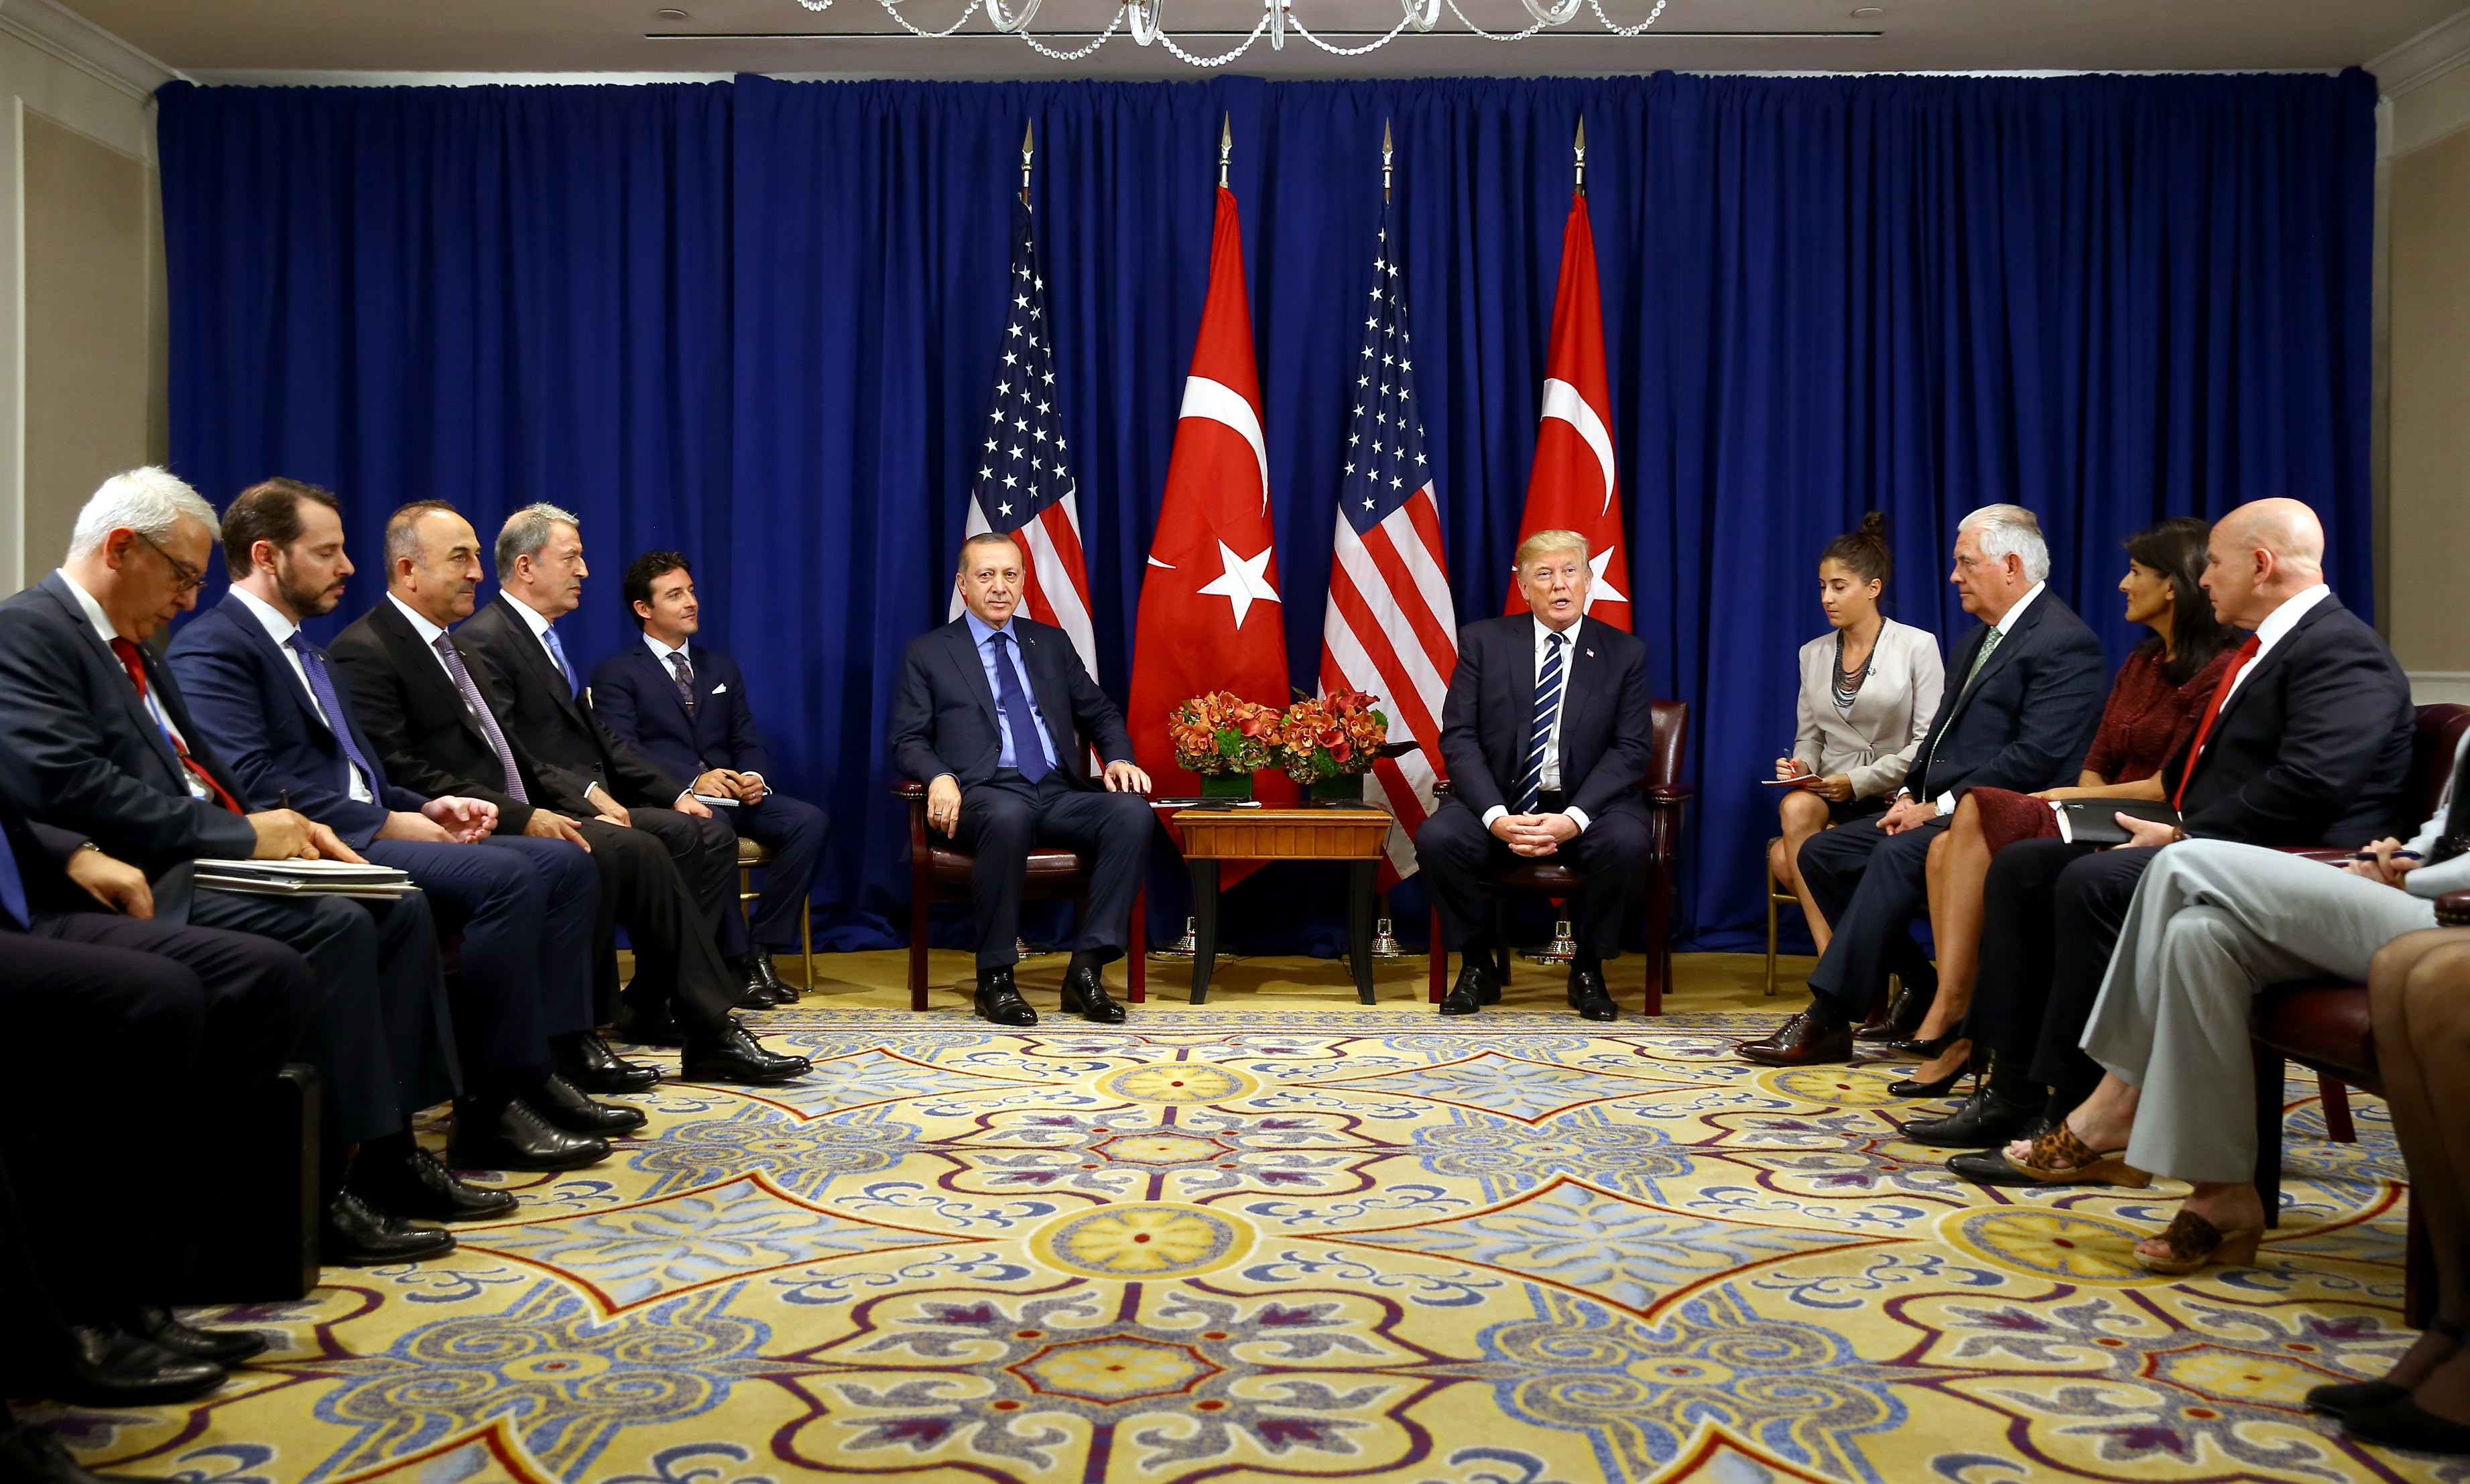 erdogan-055.jpg